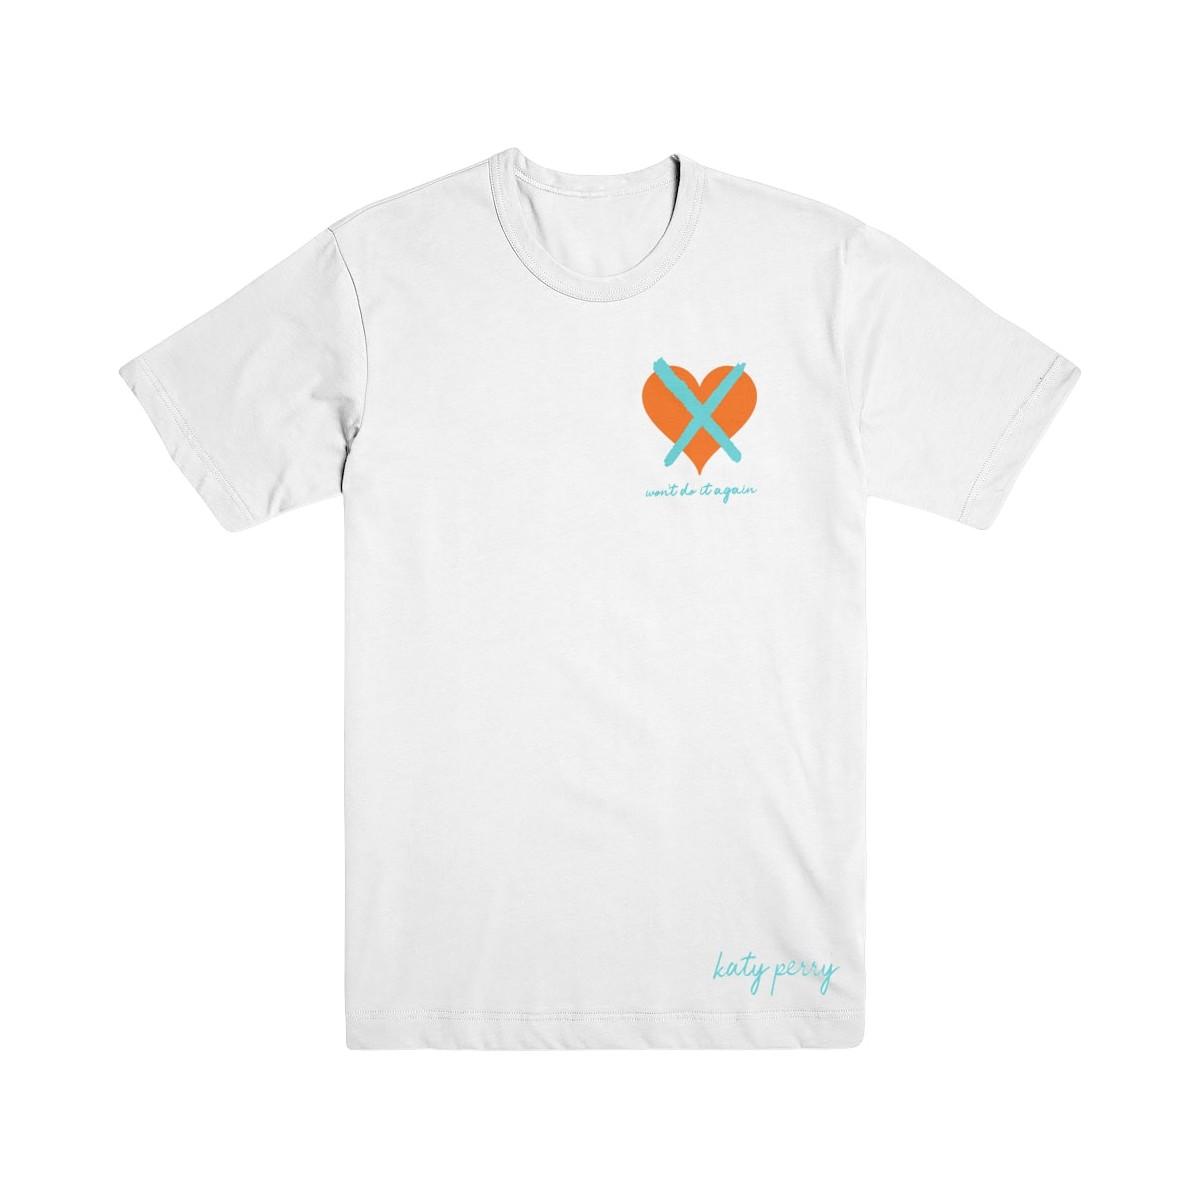 Won't Do it Again Pocket Print T-Shirt